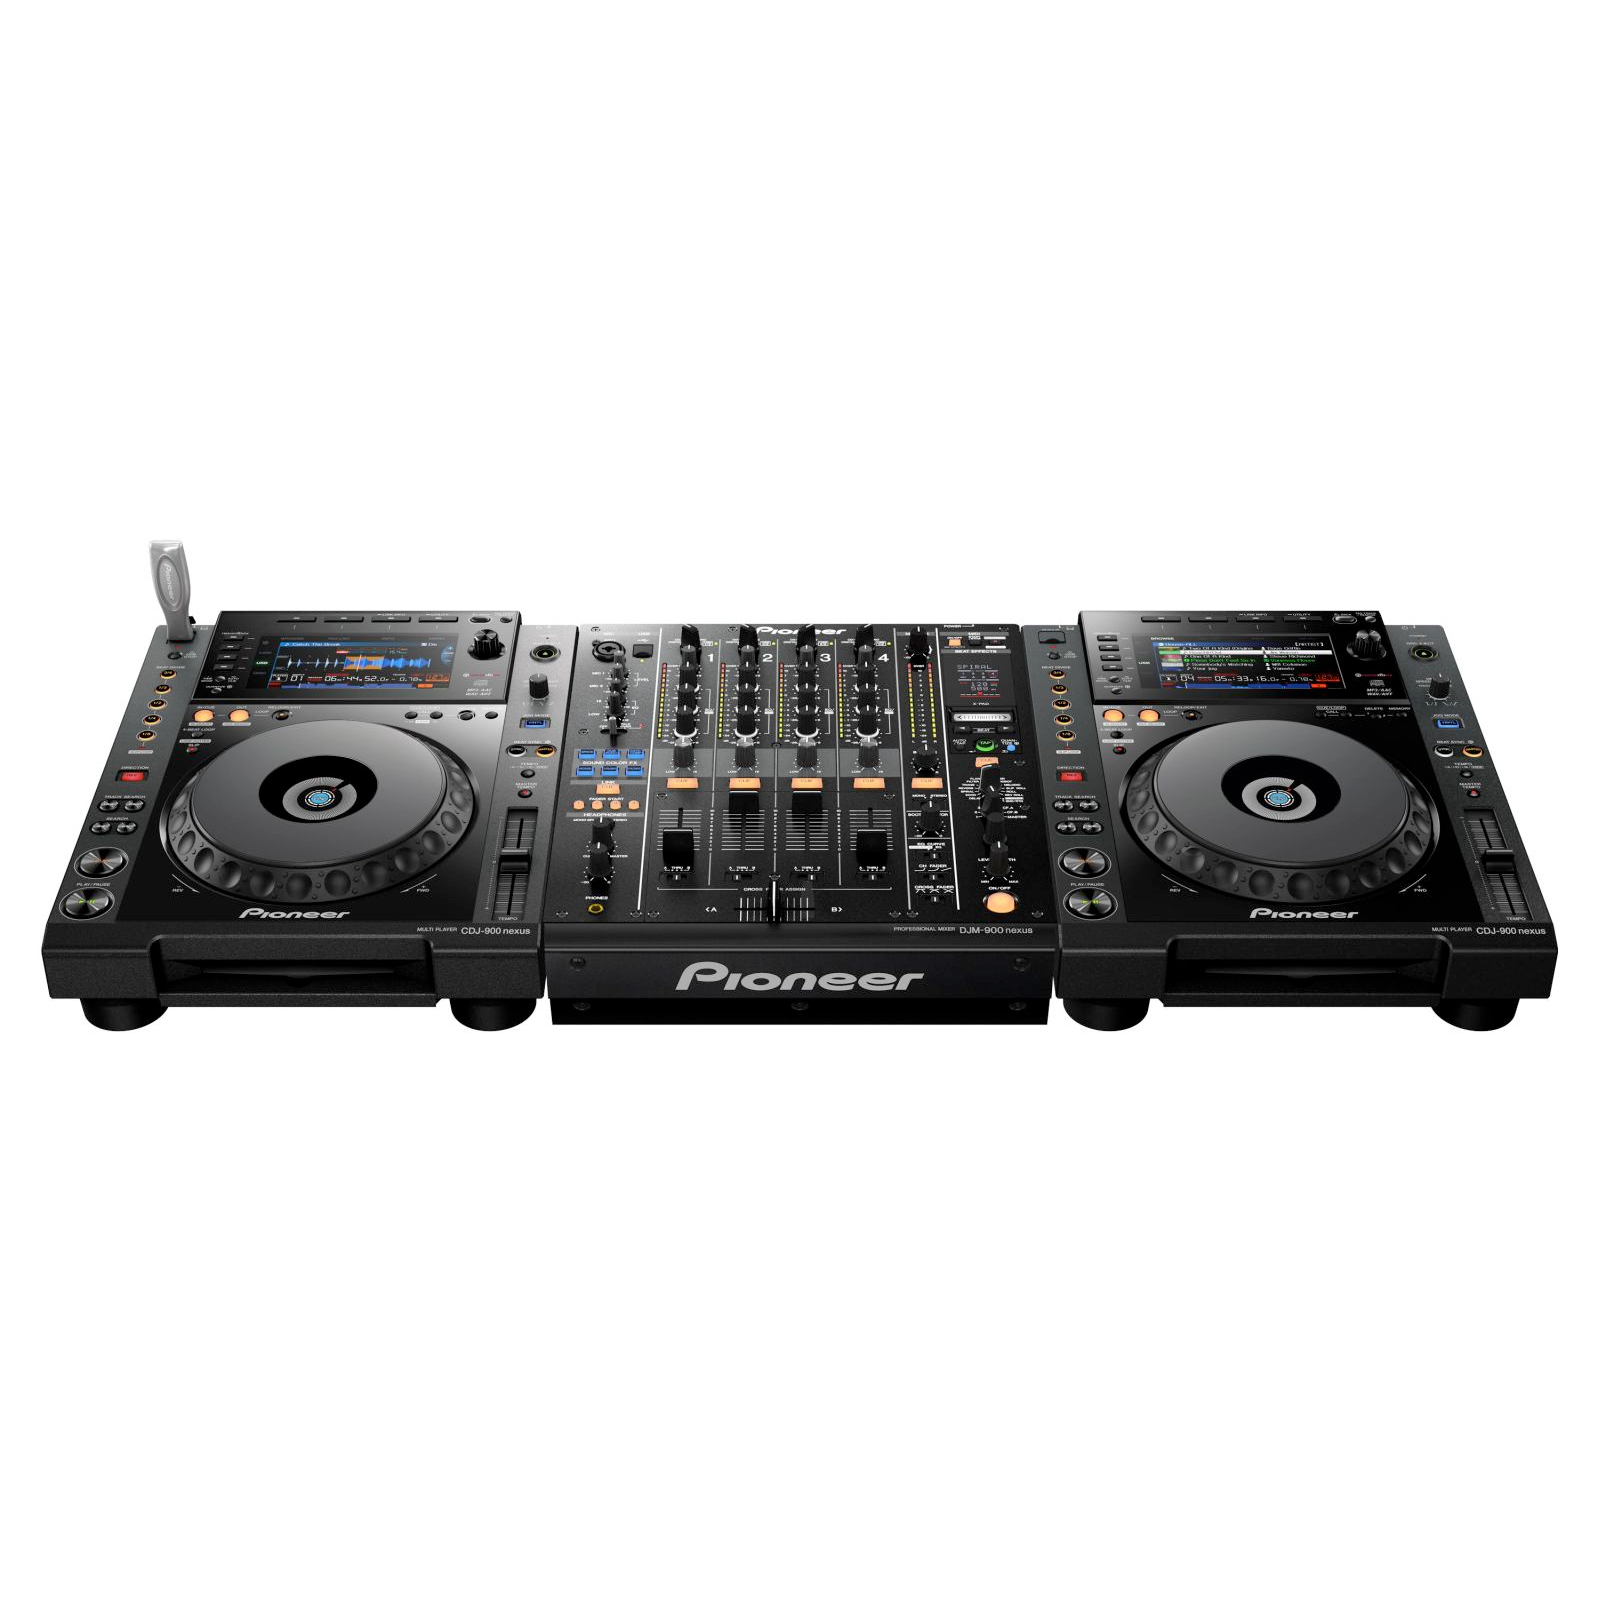 PIONEER DJM-900NXS LIMITED DJ CONTROLLER WINDOWS 10 DRIVER DOWNLOAD